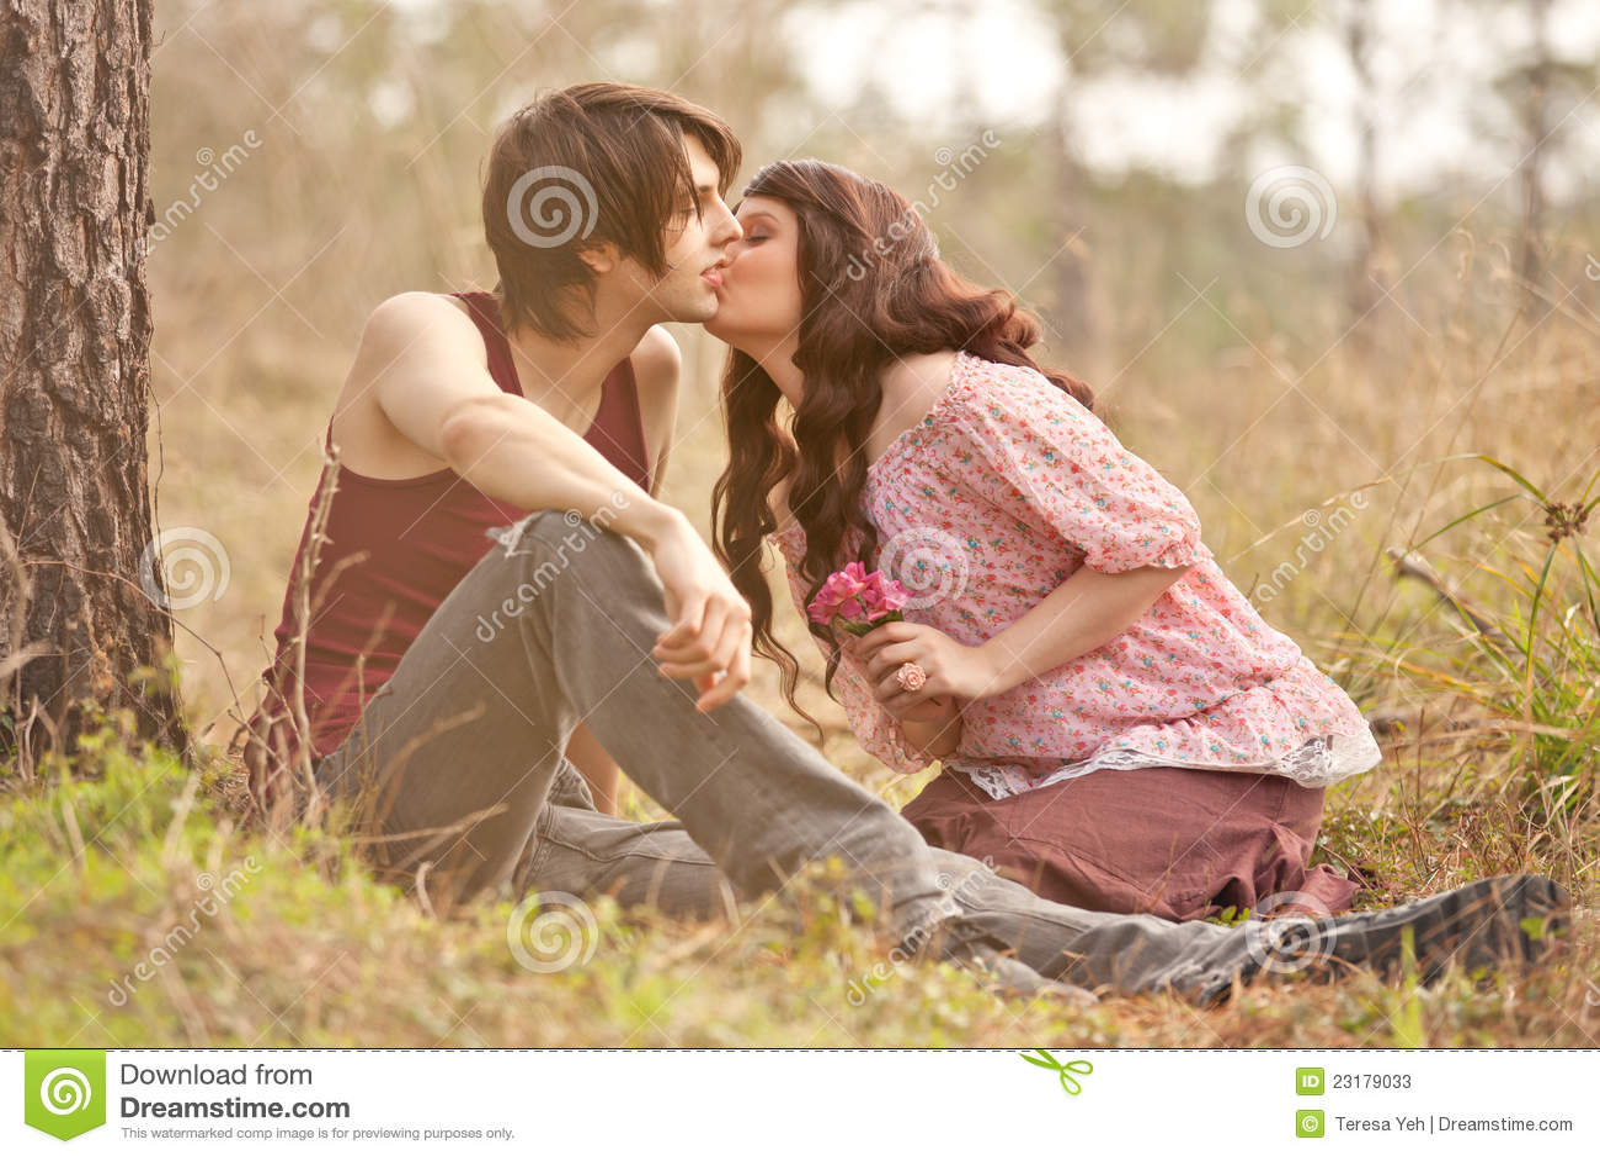 Boy And Girl Kissing Hd Wallpapers έ ί ά ό ό ό ά